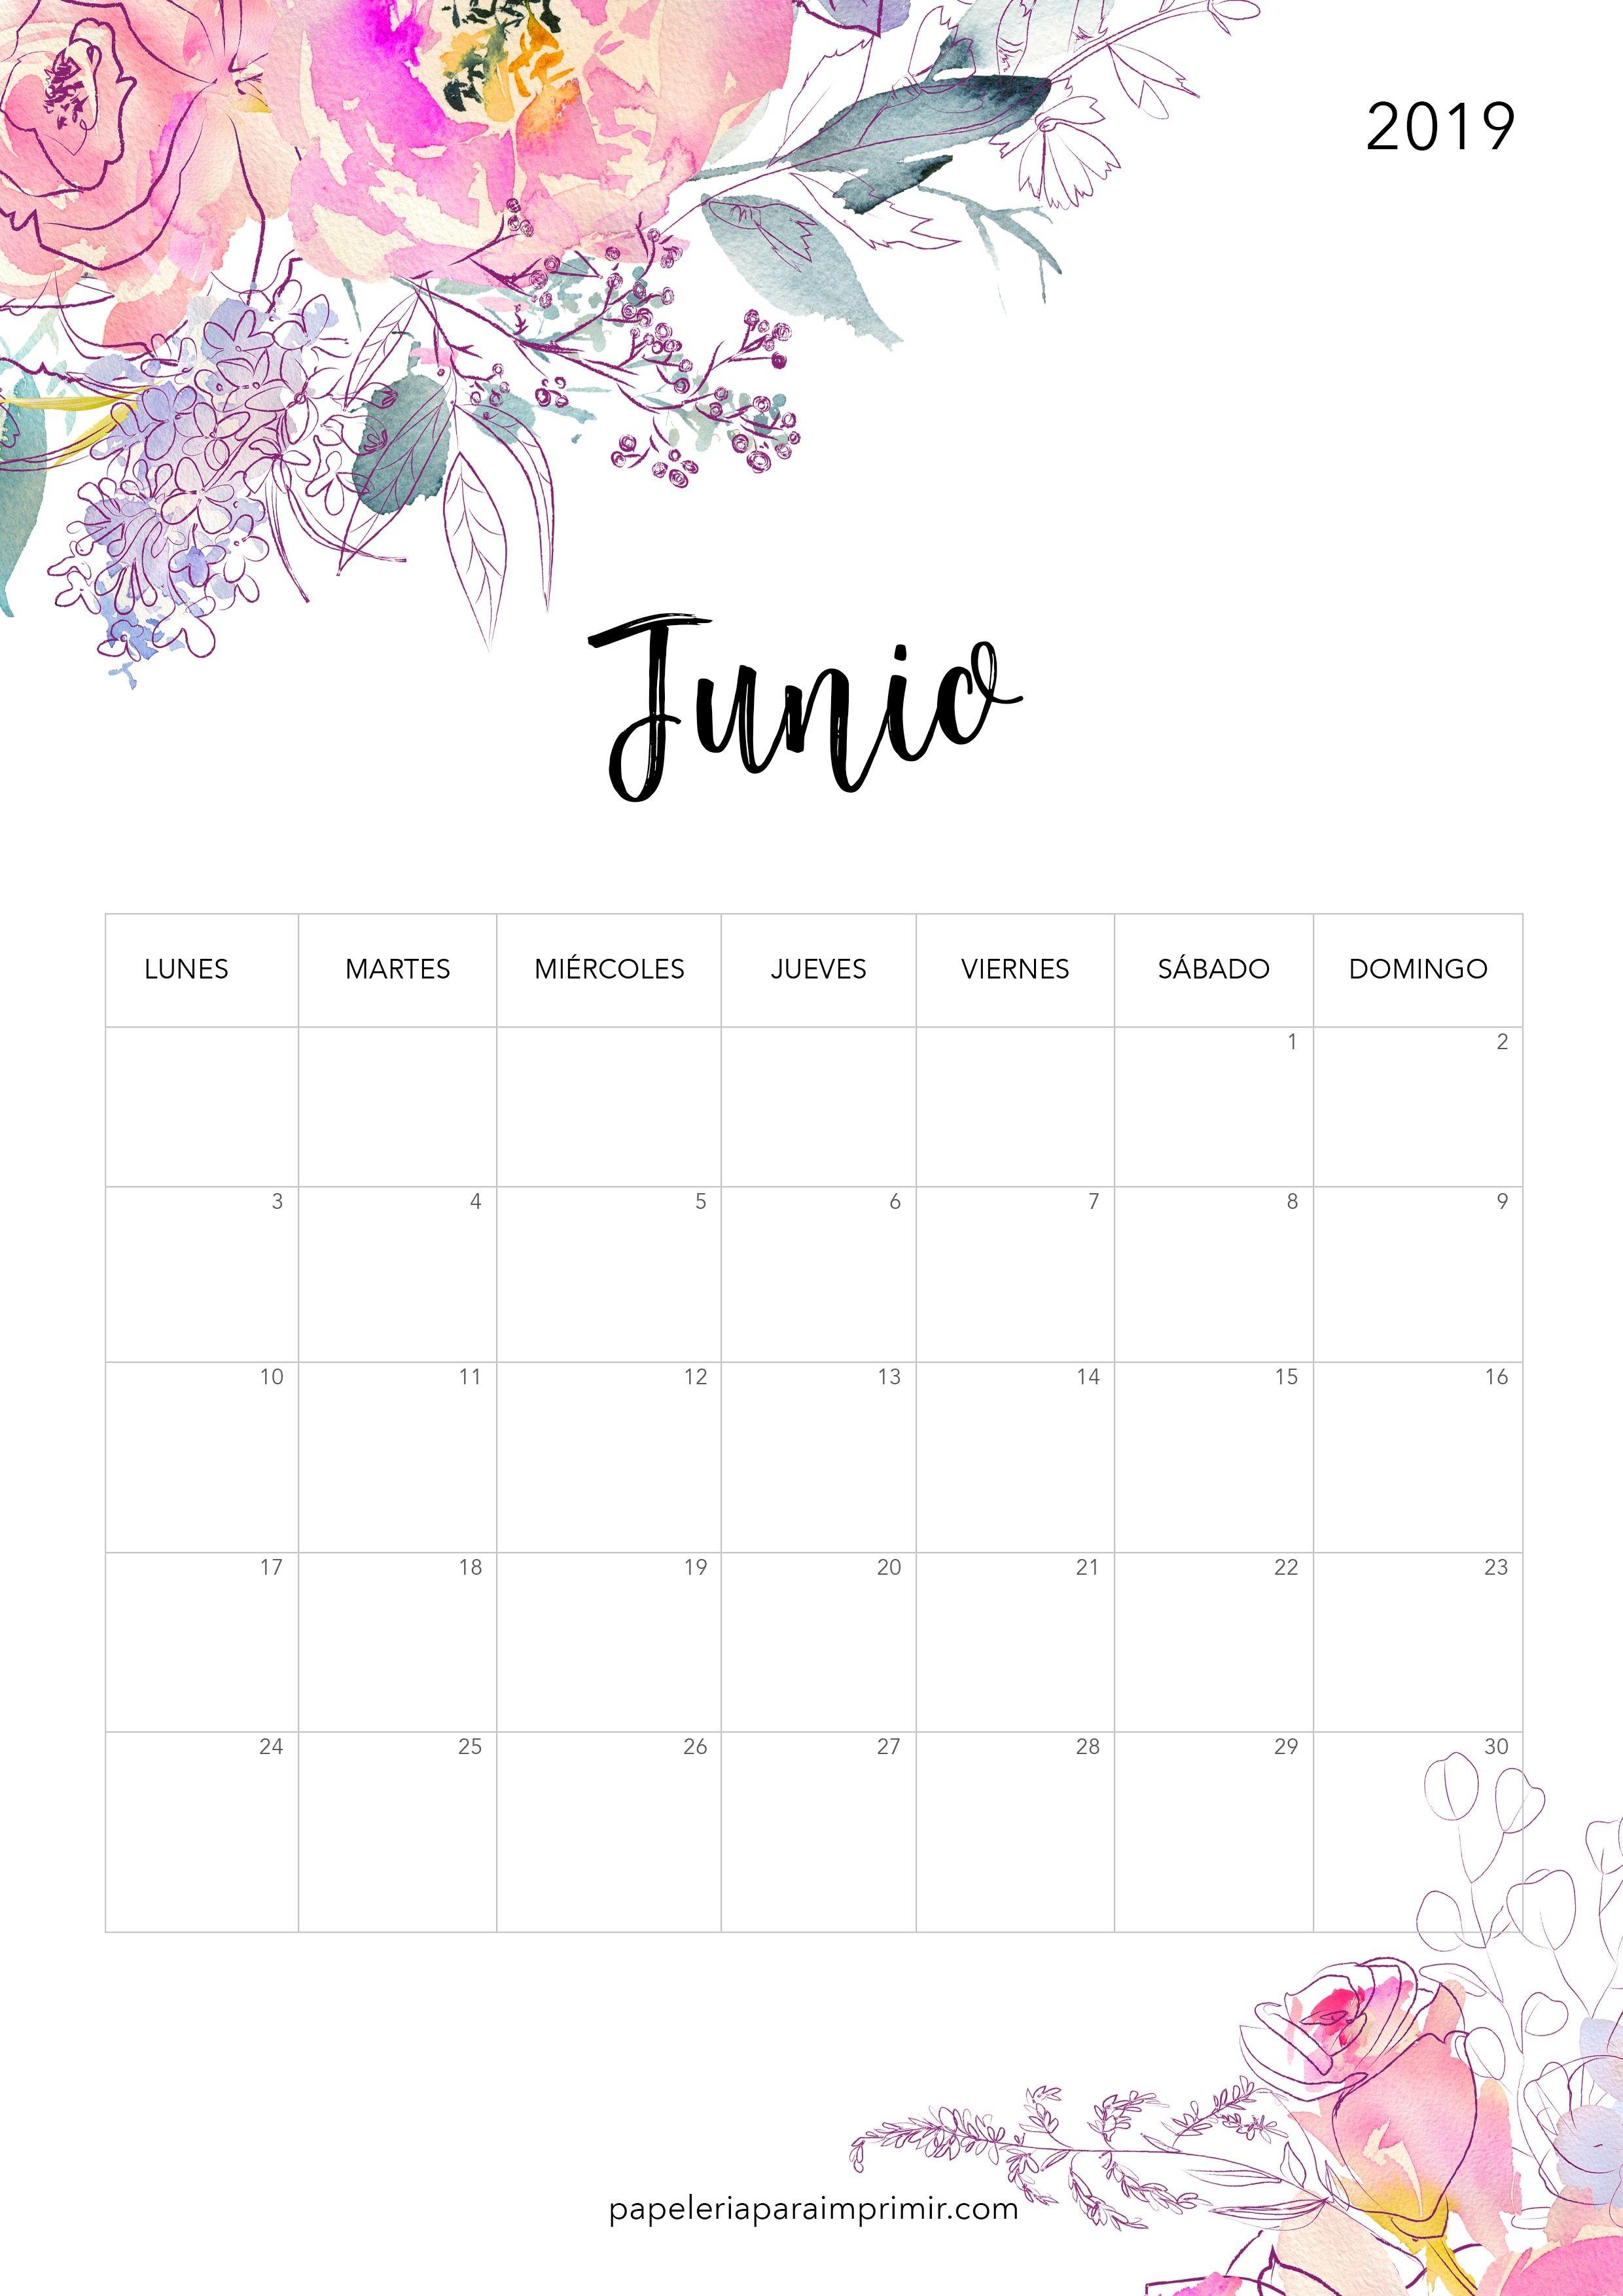 Calendario Mensual 2019 Para Imprimir.Revisar Calendario Mensual Enero 2019 Para Imprimir Calendario 2019